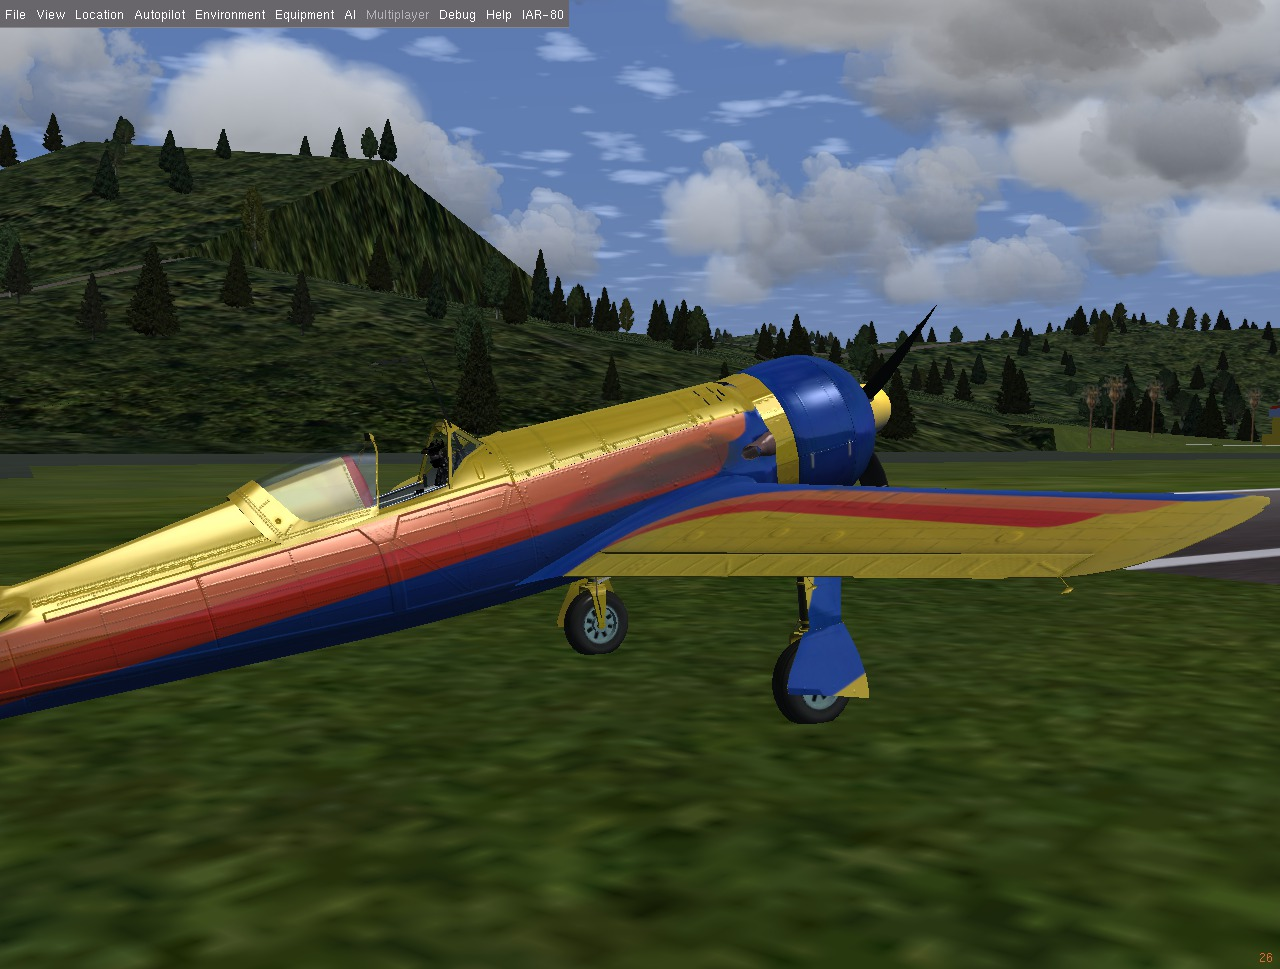 a quoi ça ressemble un avion qui utilise les ubershader ?? IAR80-ubershader1